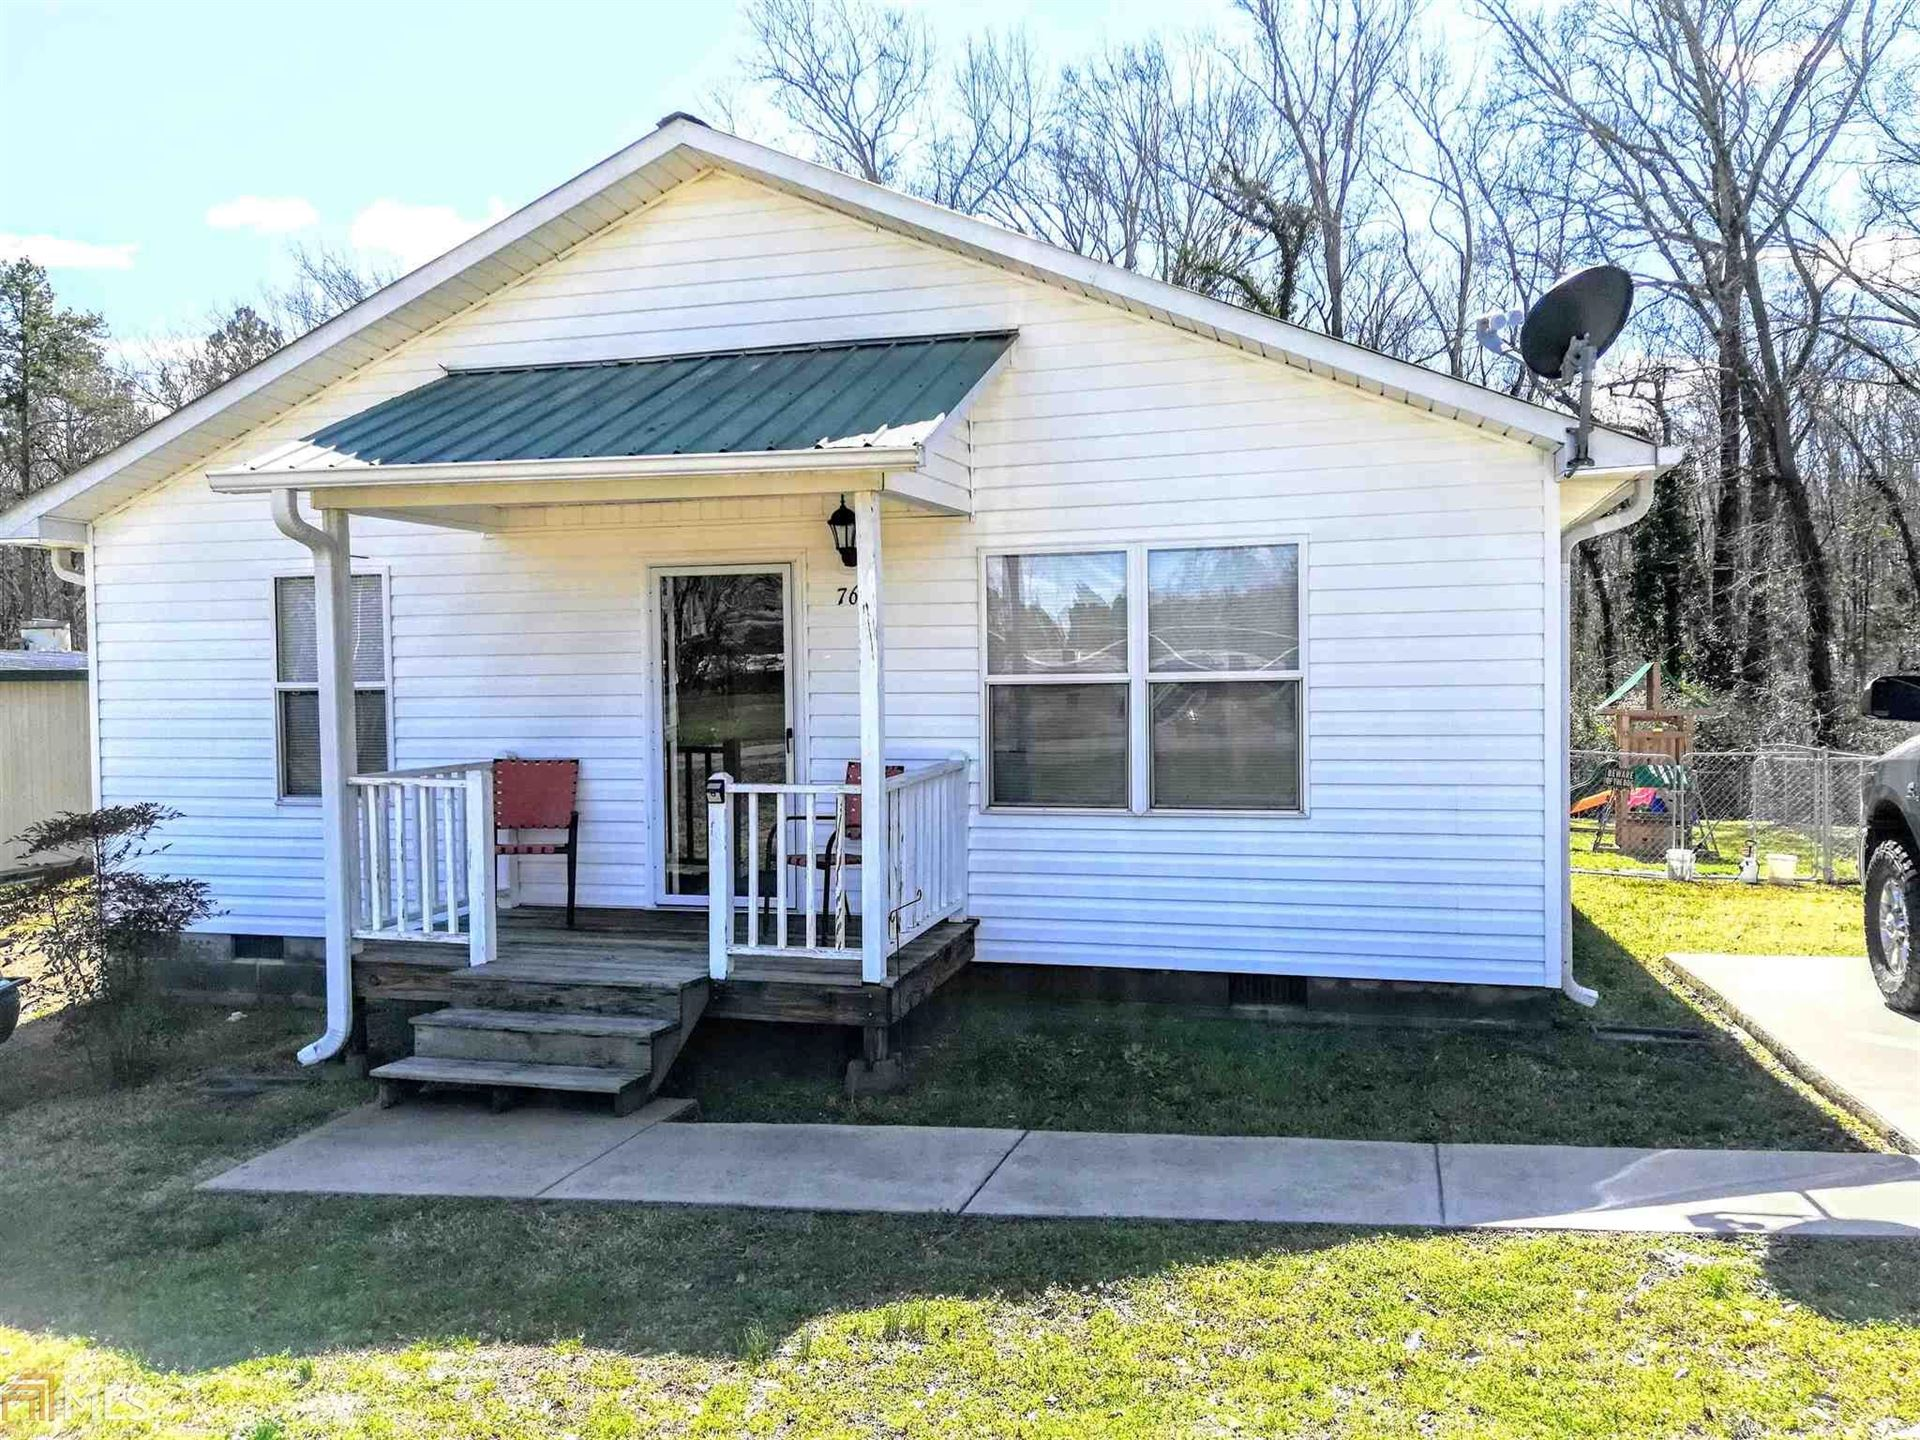 76 Clairmont, Elberton, GA 30635 - #: 8747009